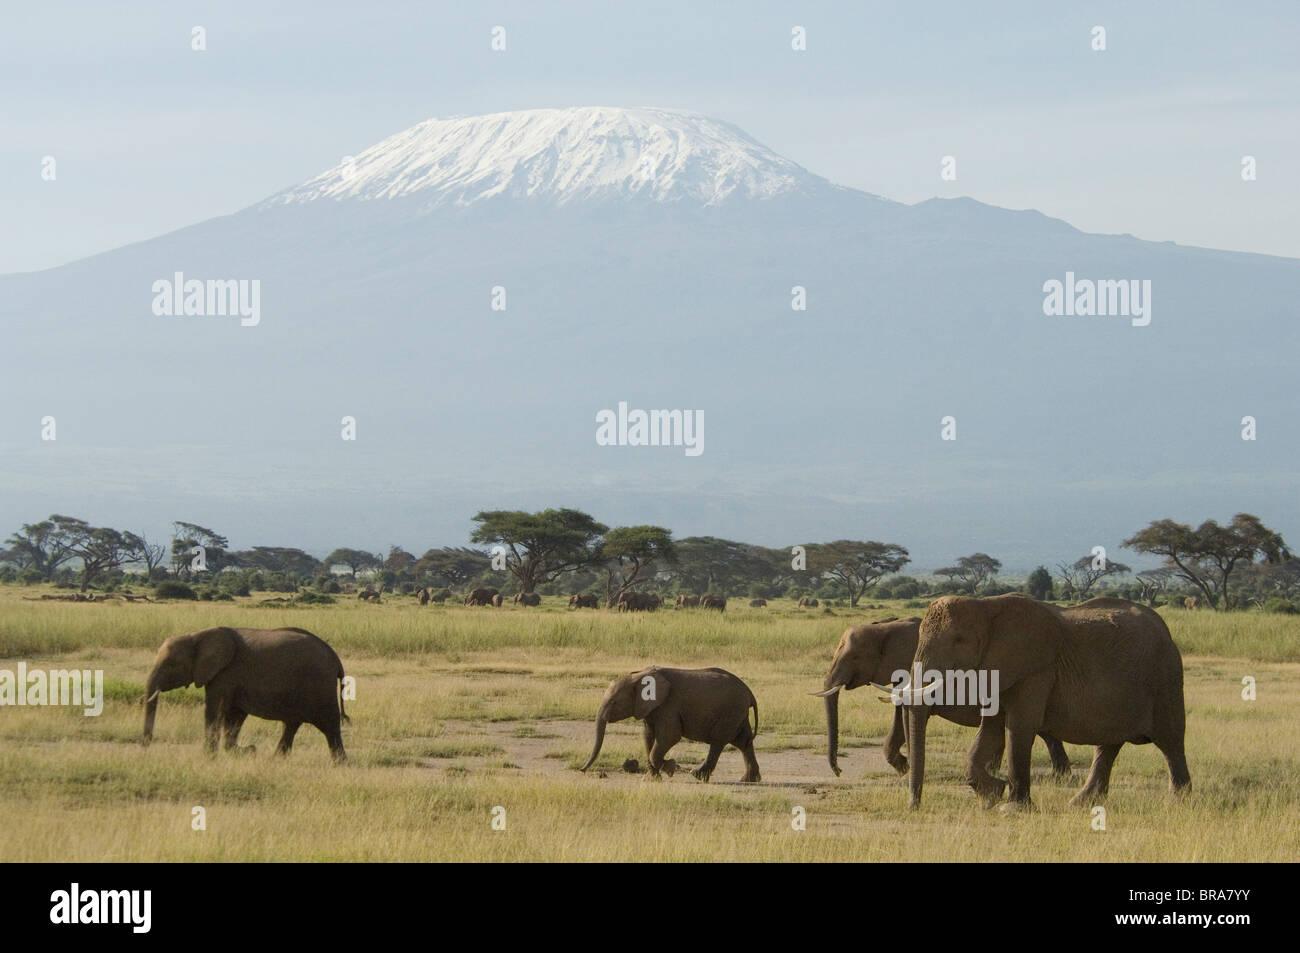 ELEPHANTS WALKING IN FRONT OF MOUNT KILIMANJARO AMBOSELI NATIONAL PARK KENYA AFRICA - Stock Image